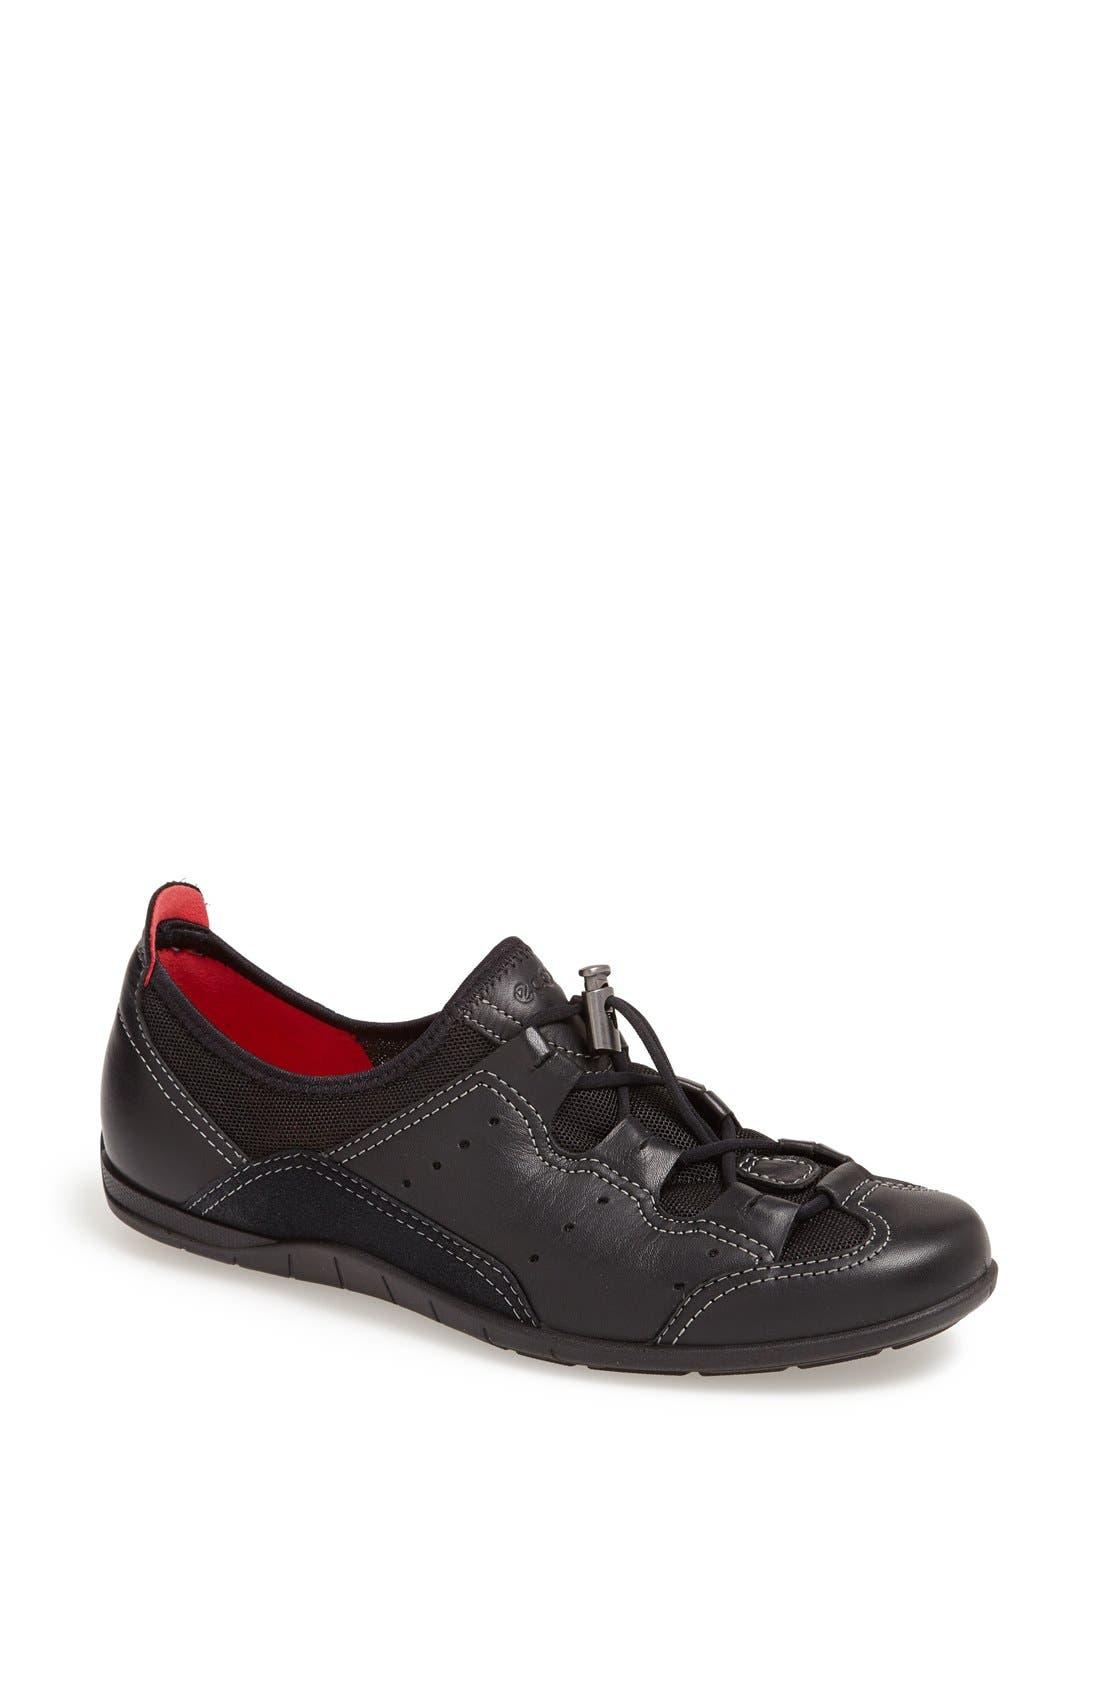 Main Image - ECCO 'Bluma' Sneaker (Women)